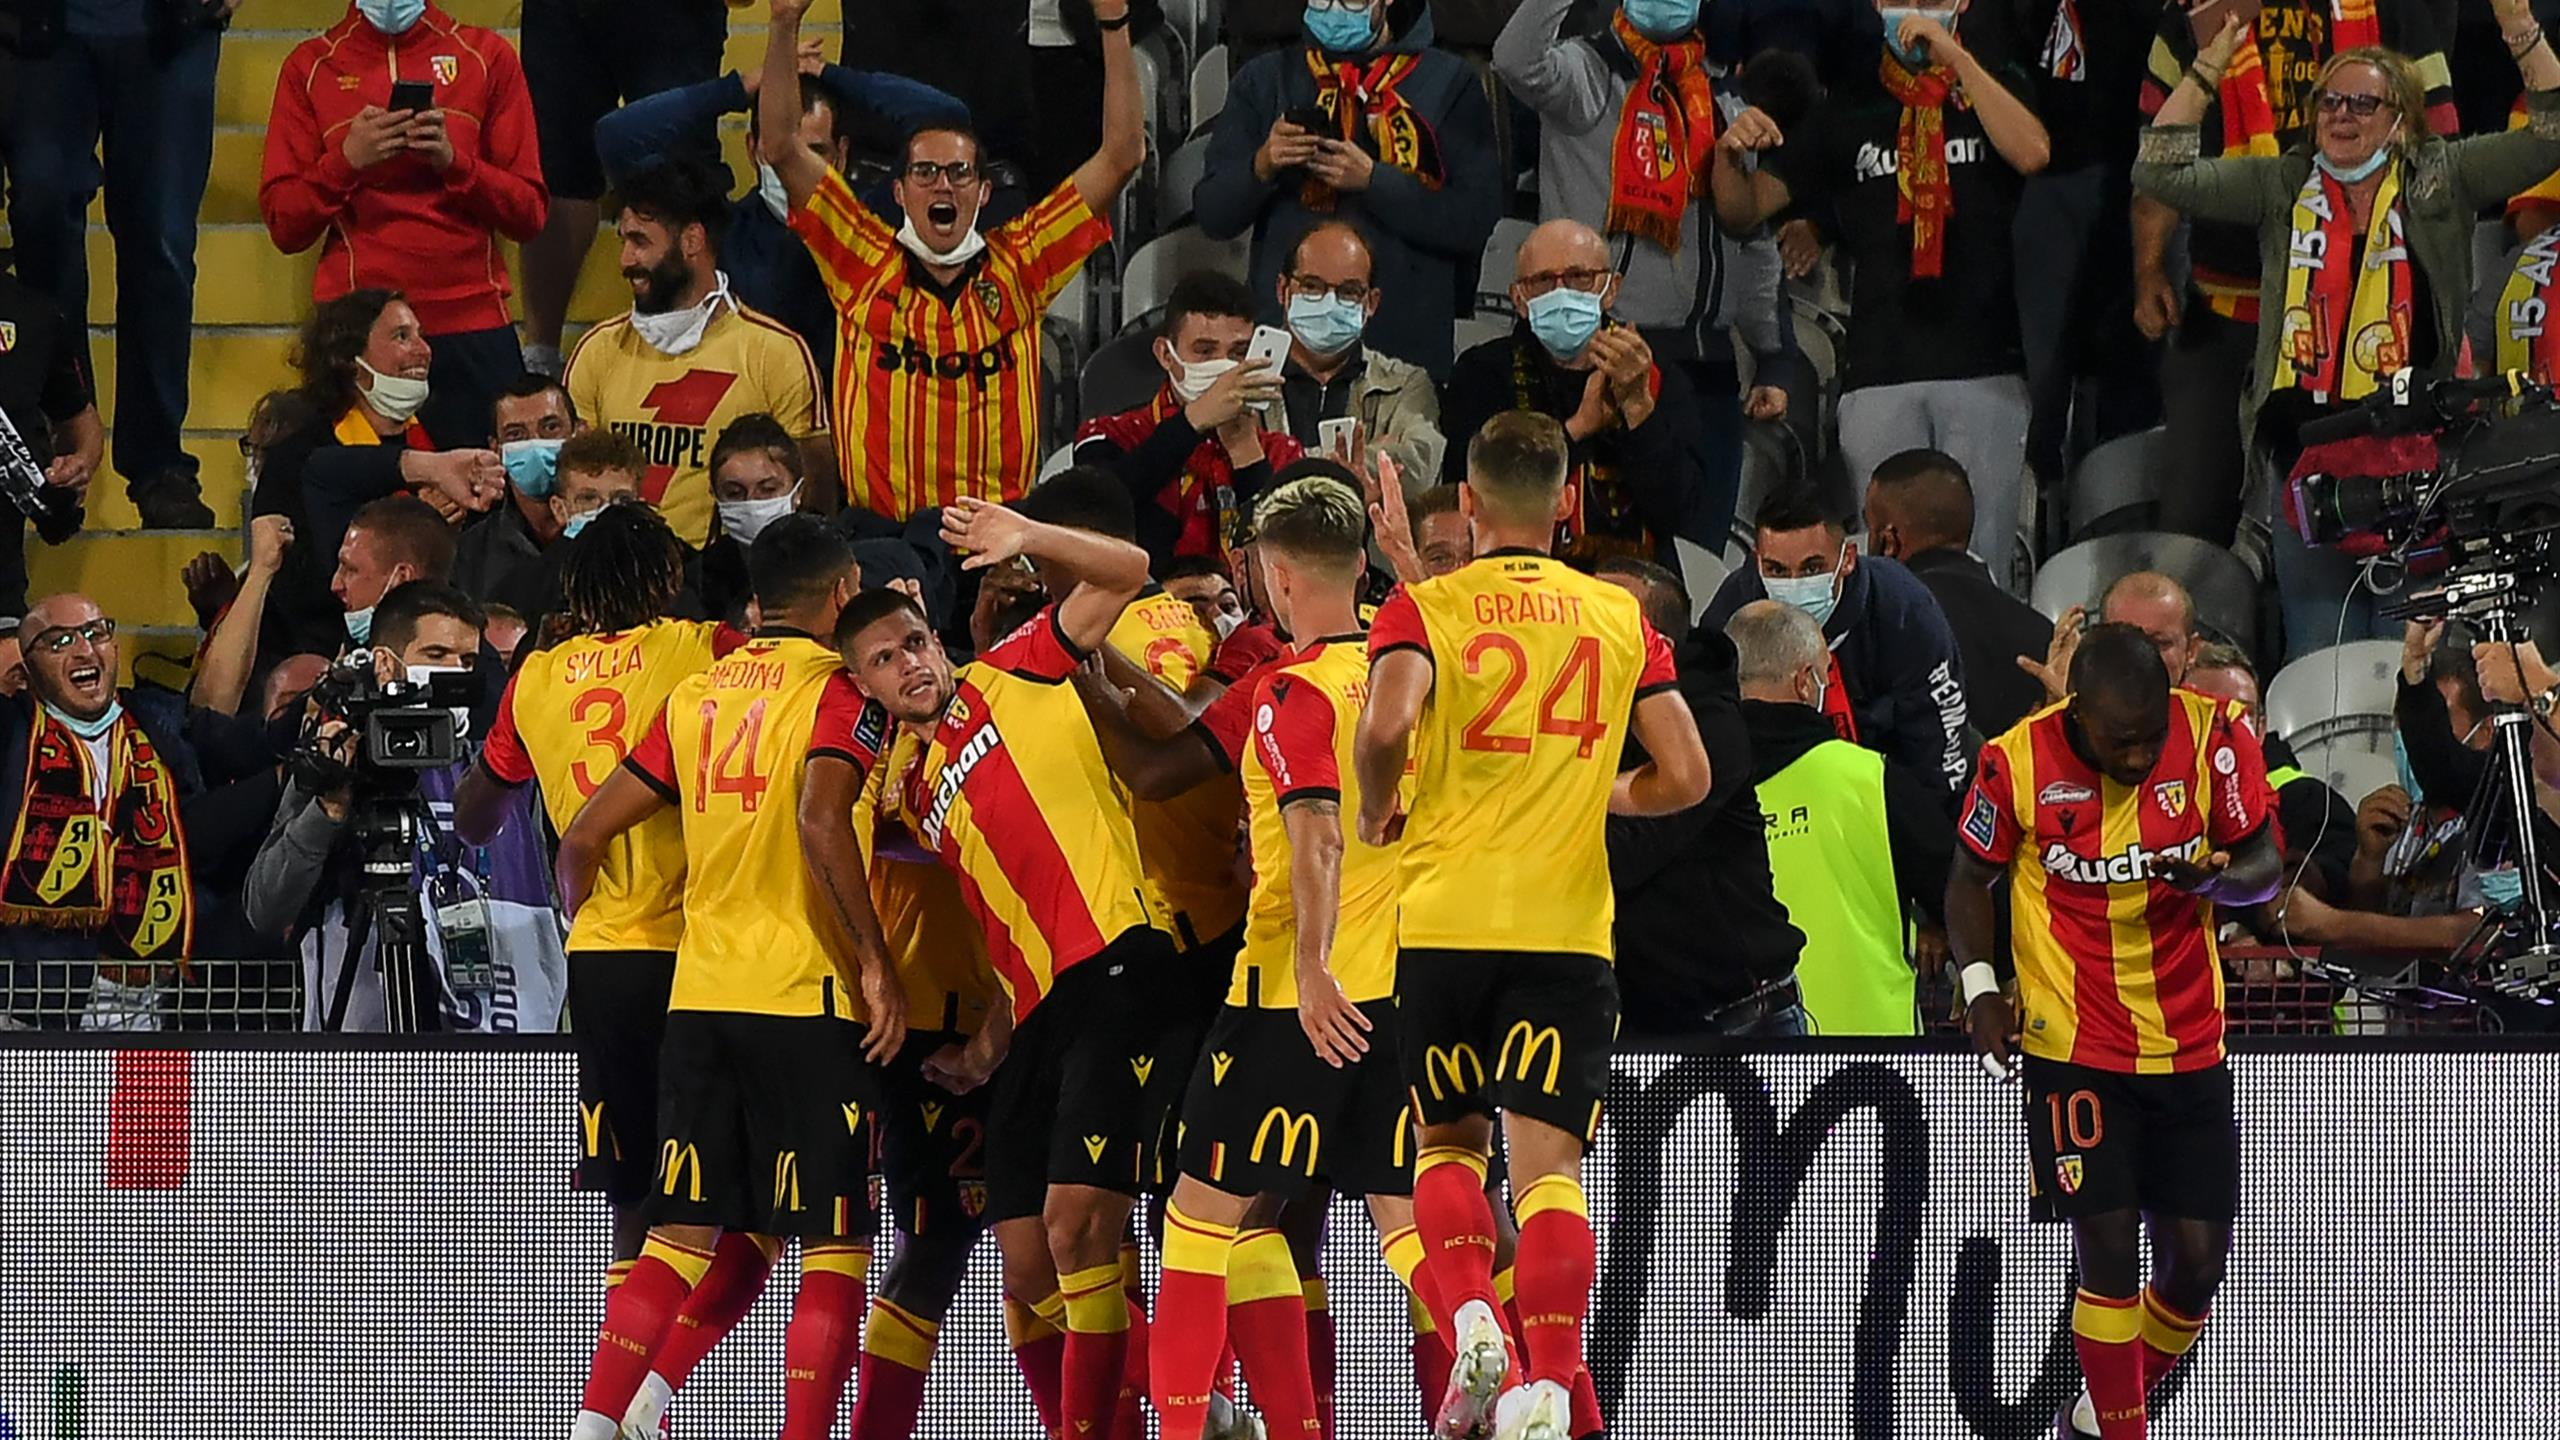 Marcin Bulka Howler Sees Champions Psg Slip To Lens Defeat In First Game Of Season Eurosport